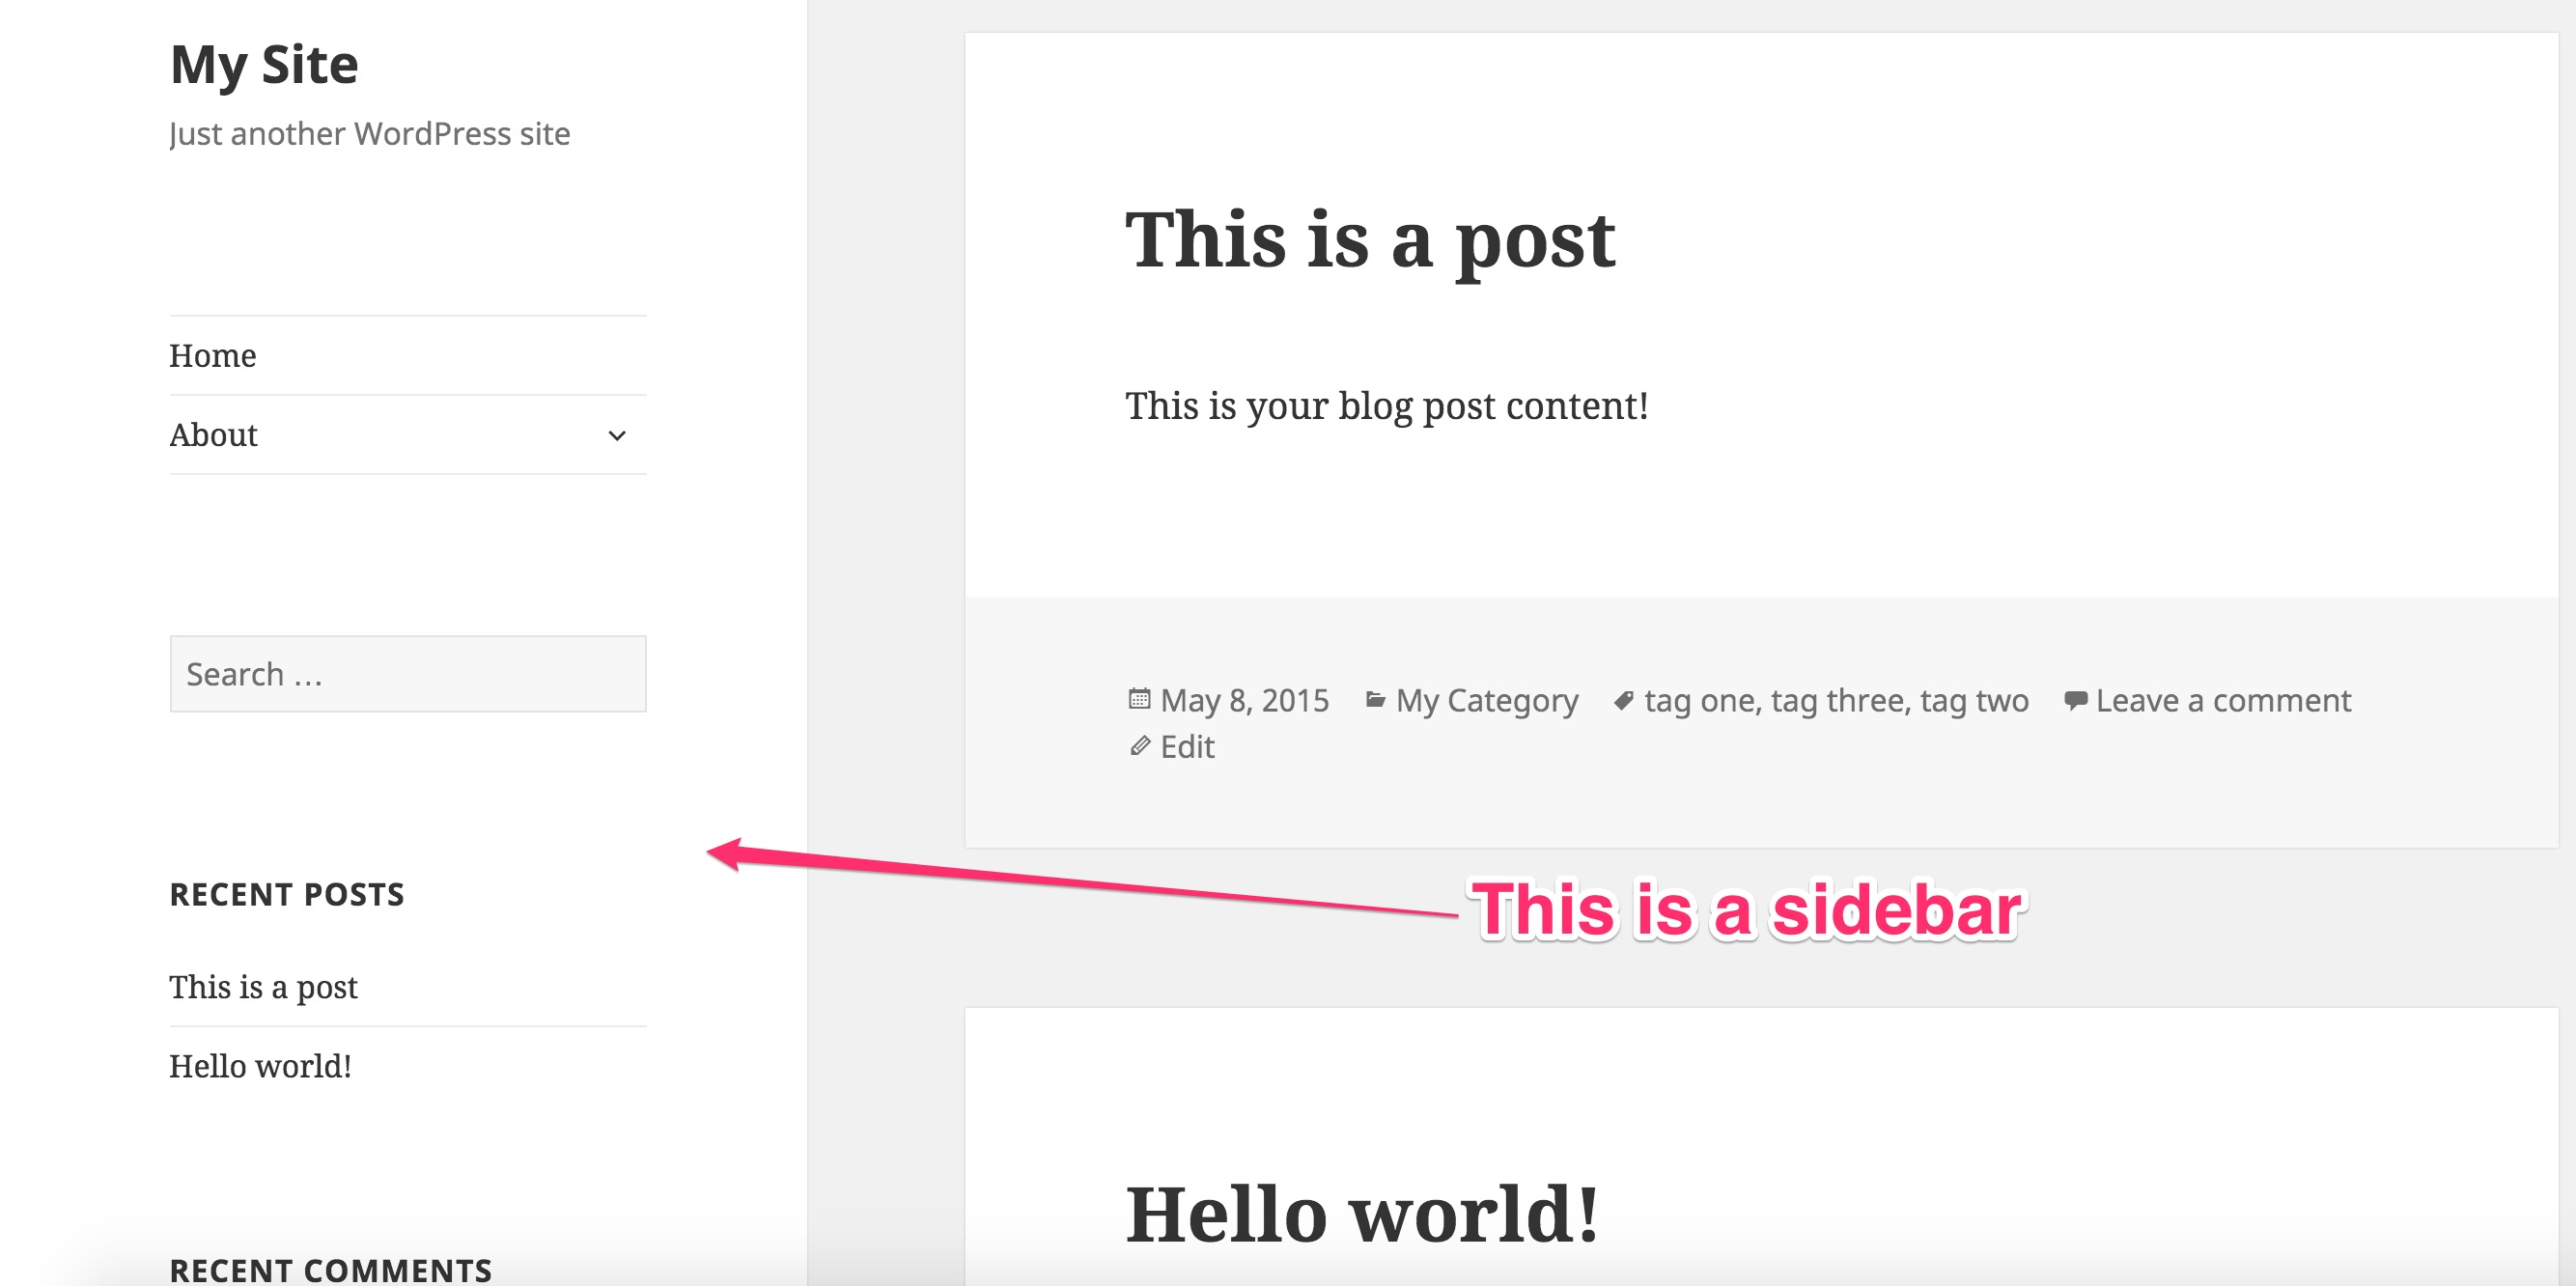 Example of a Sidebar in WordPress